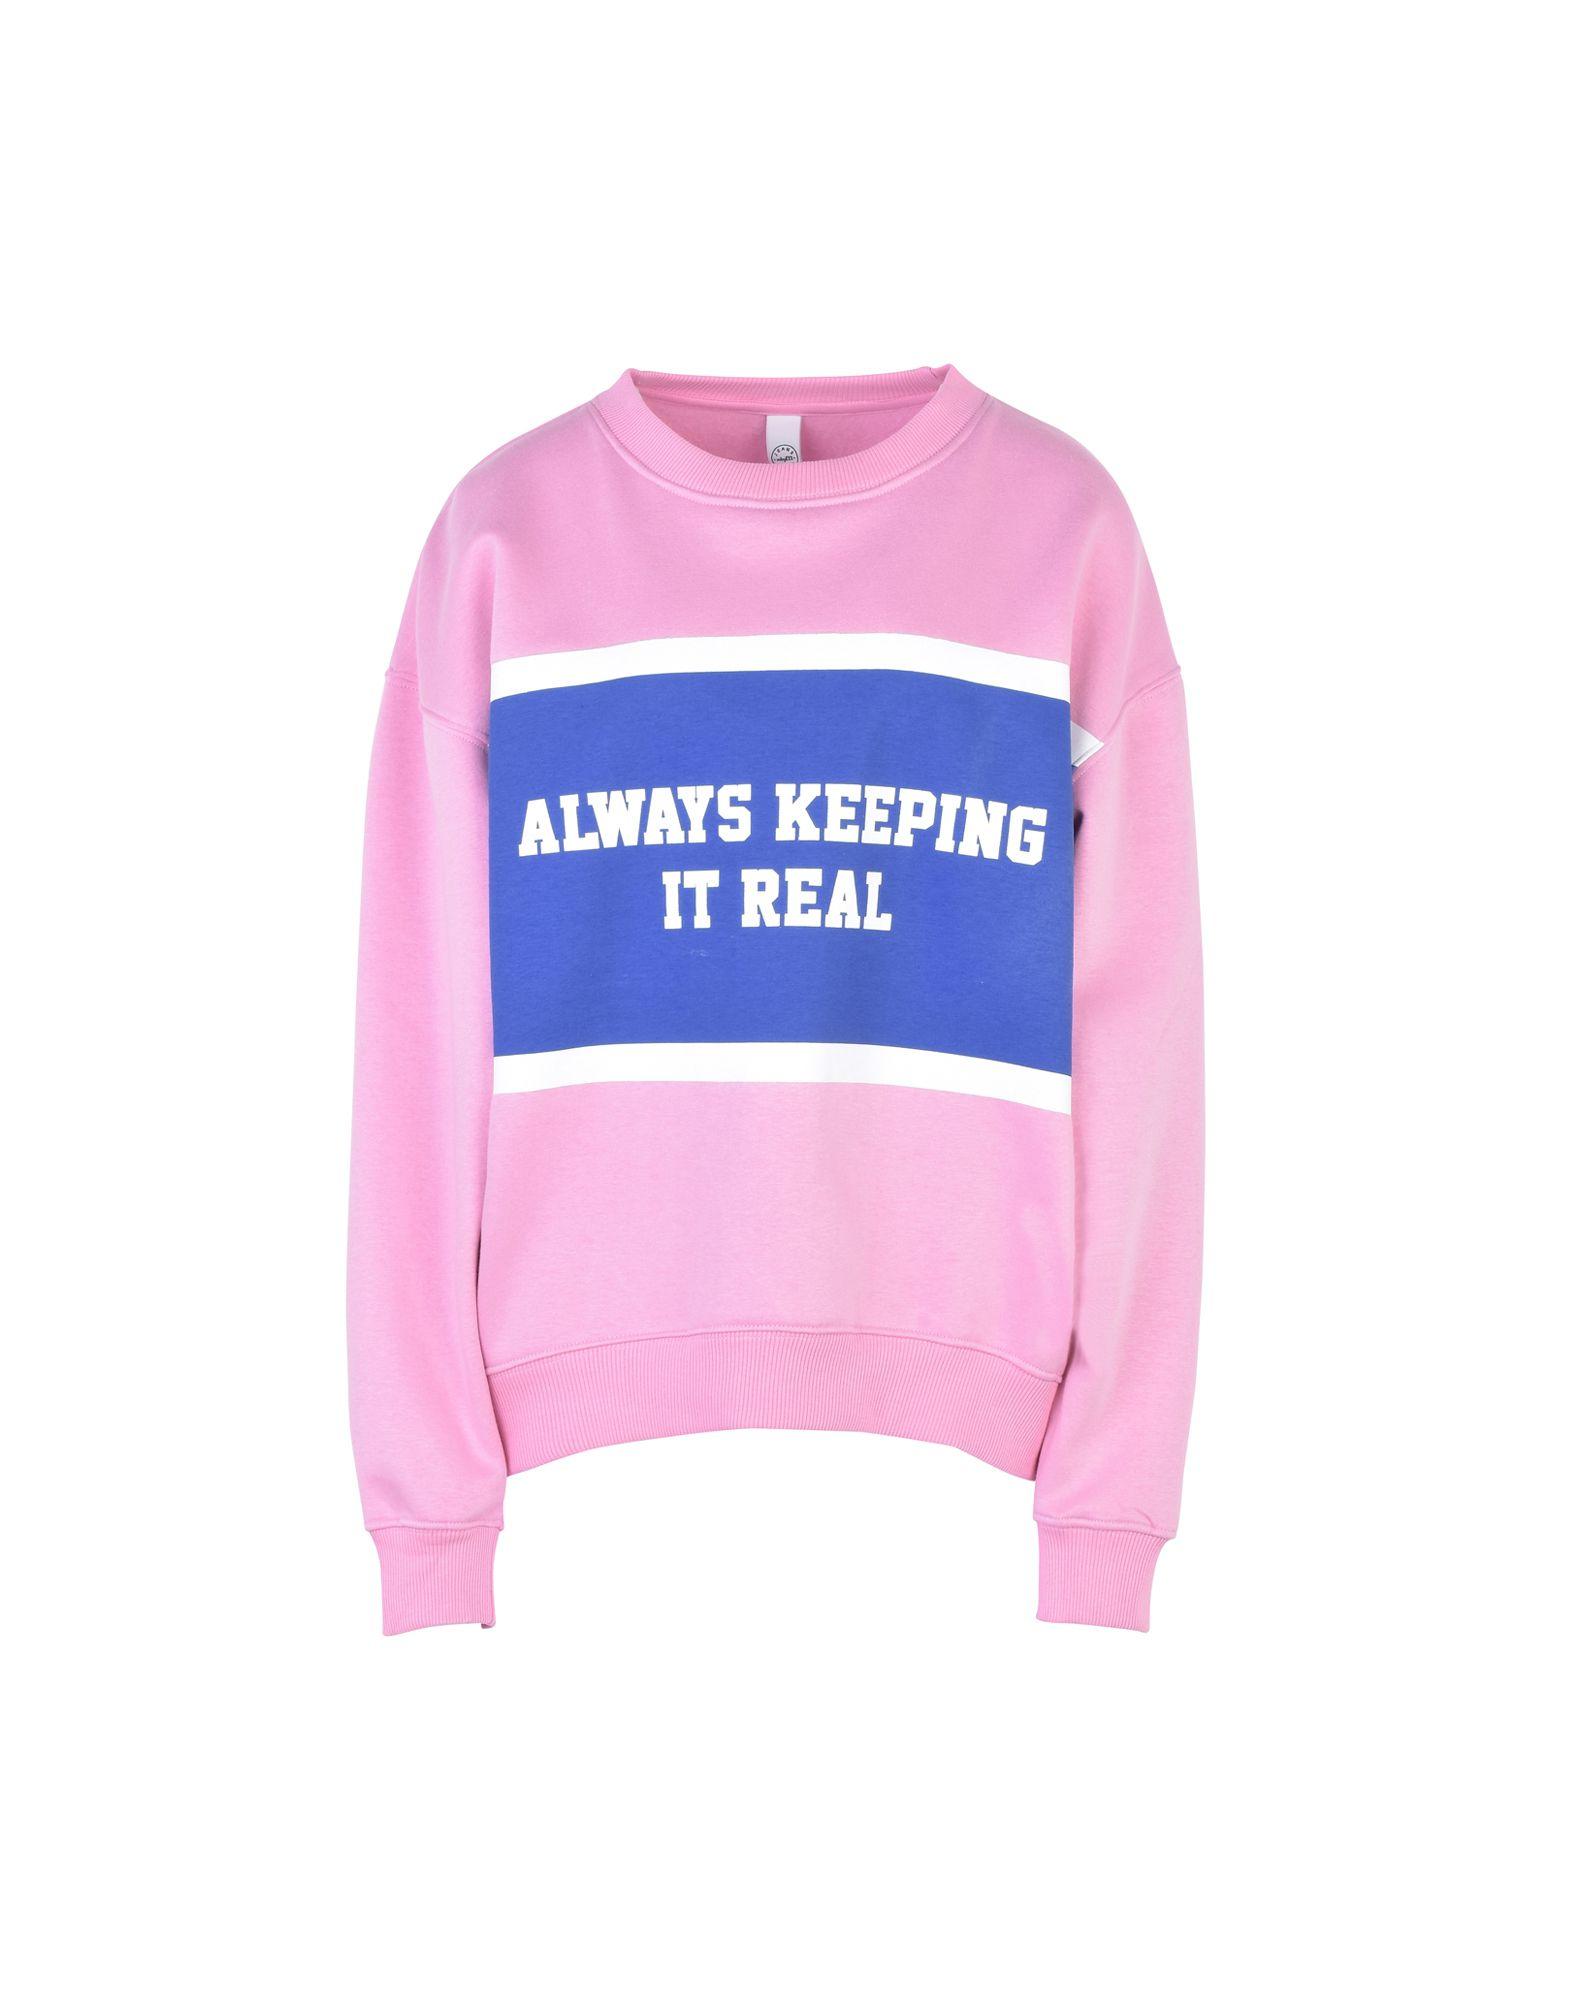 MBYM Sweatshirt in Pink